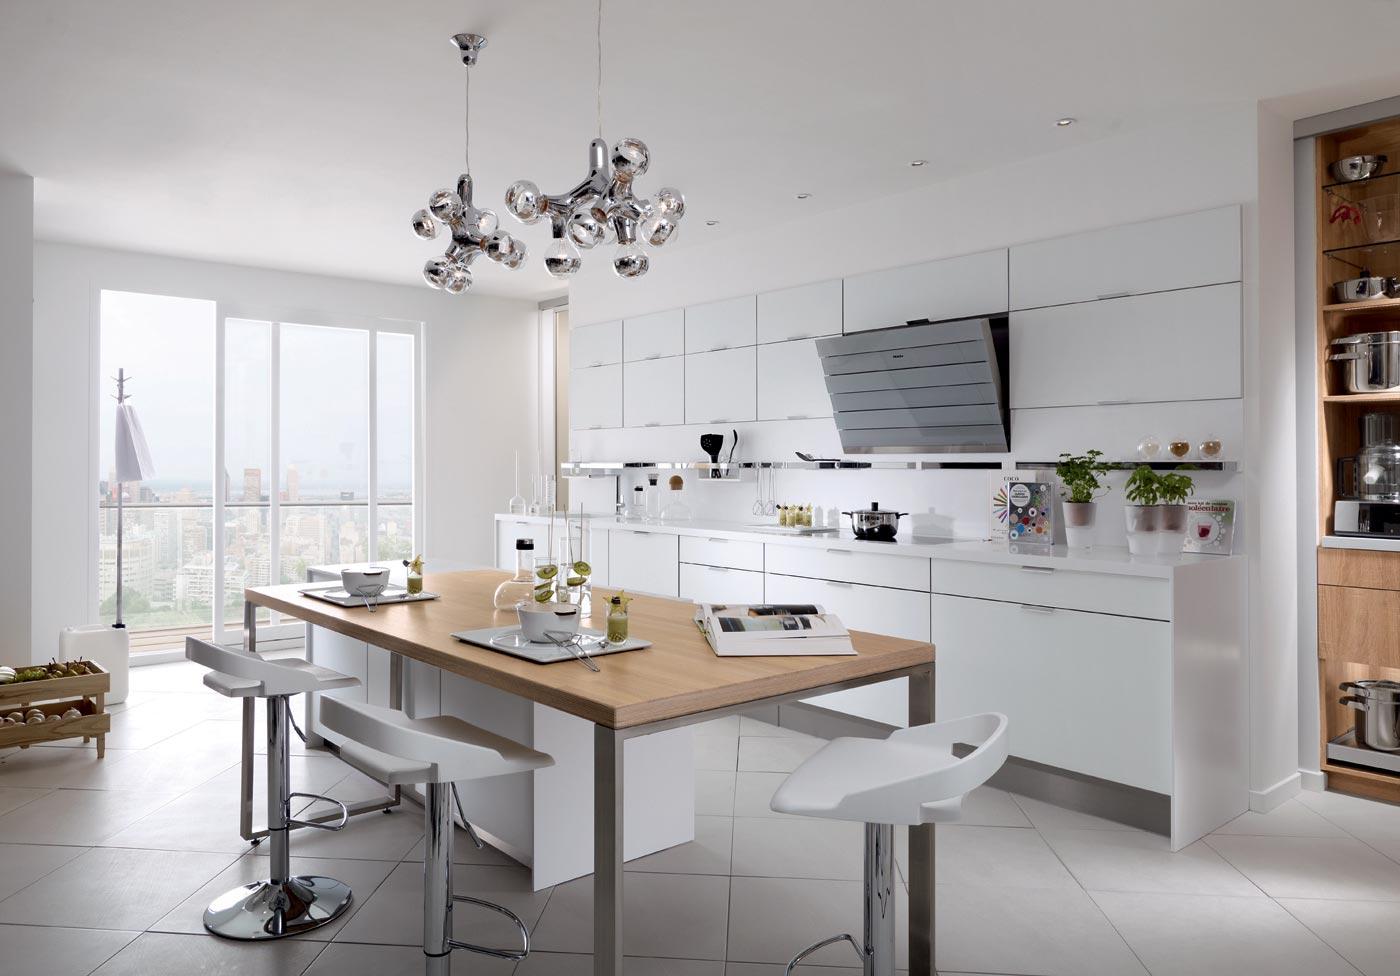 Cuisine m100 m lamin blanc pur mat rustica clair for Cuisine lineaire design